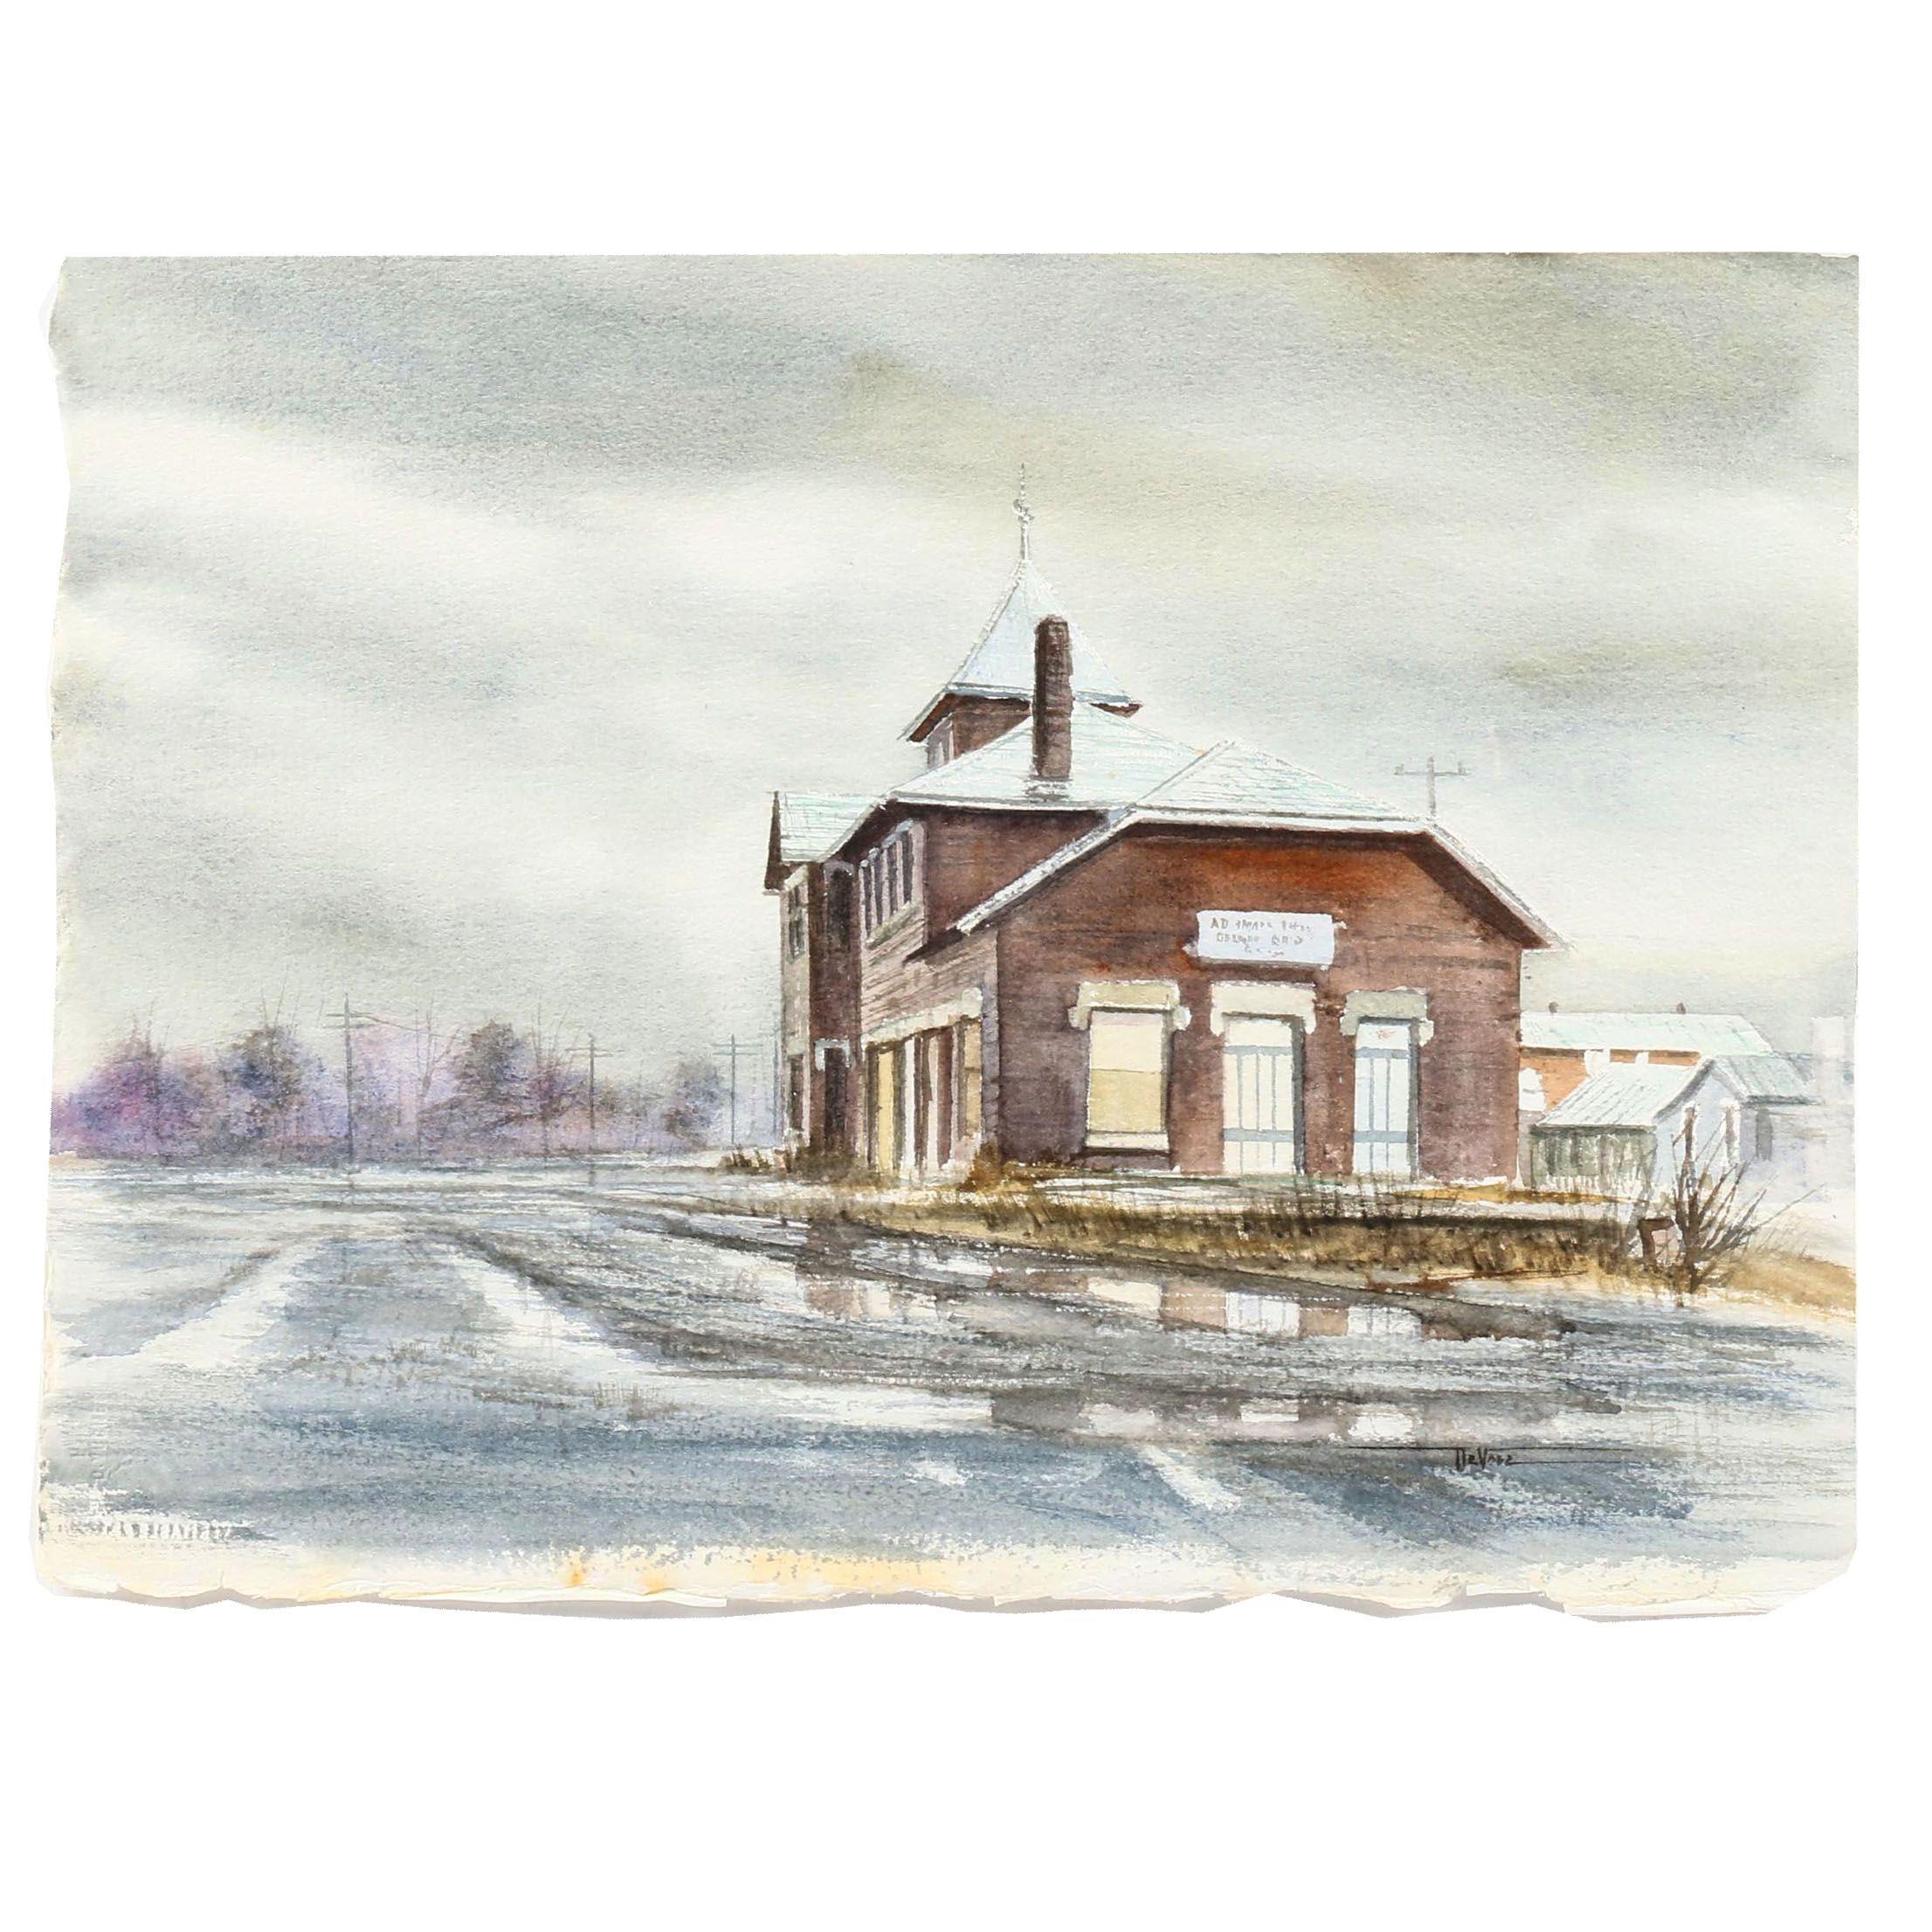 James DeVore Watercolor Painting of Church